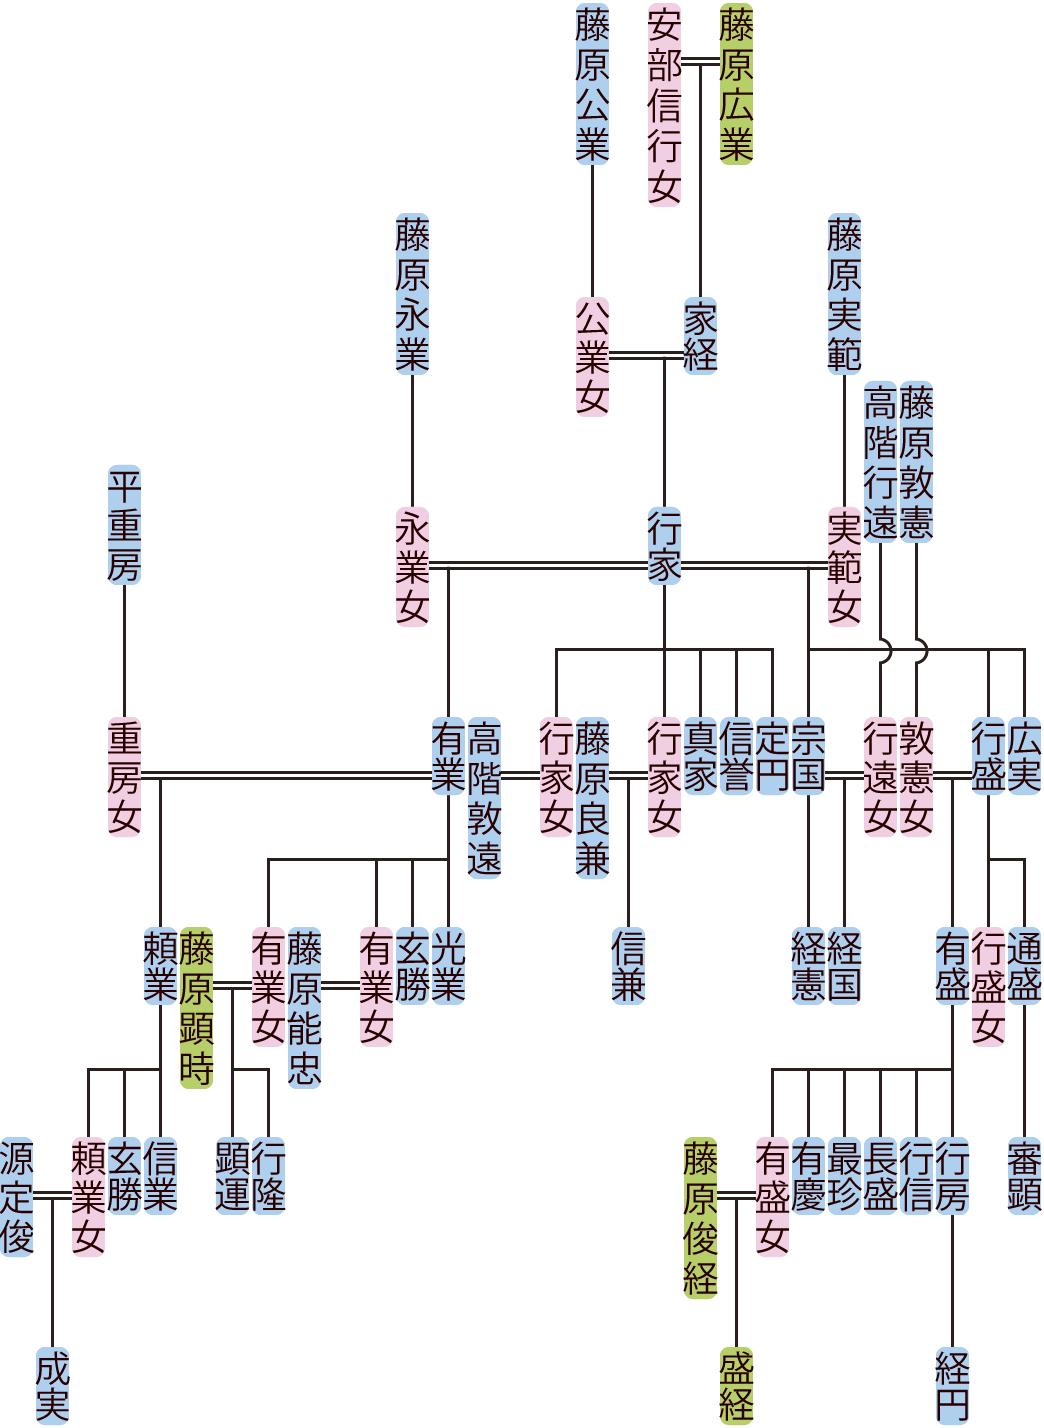 藤原行家の系図